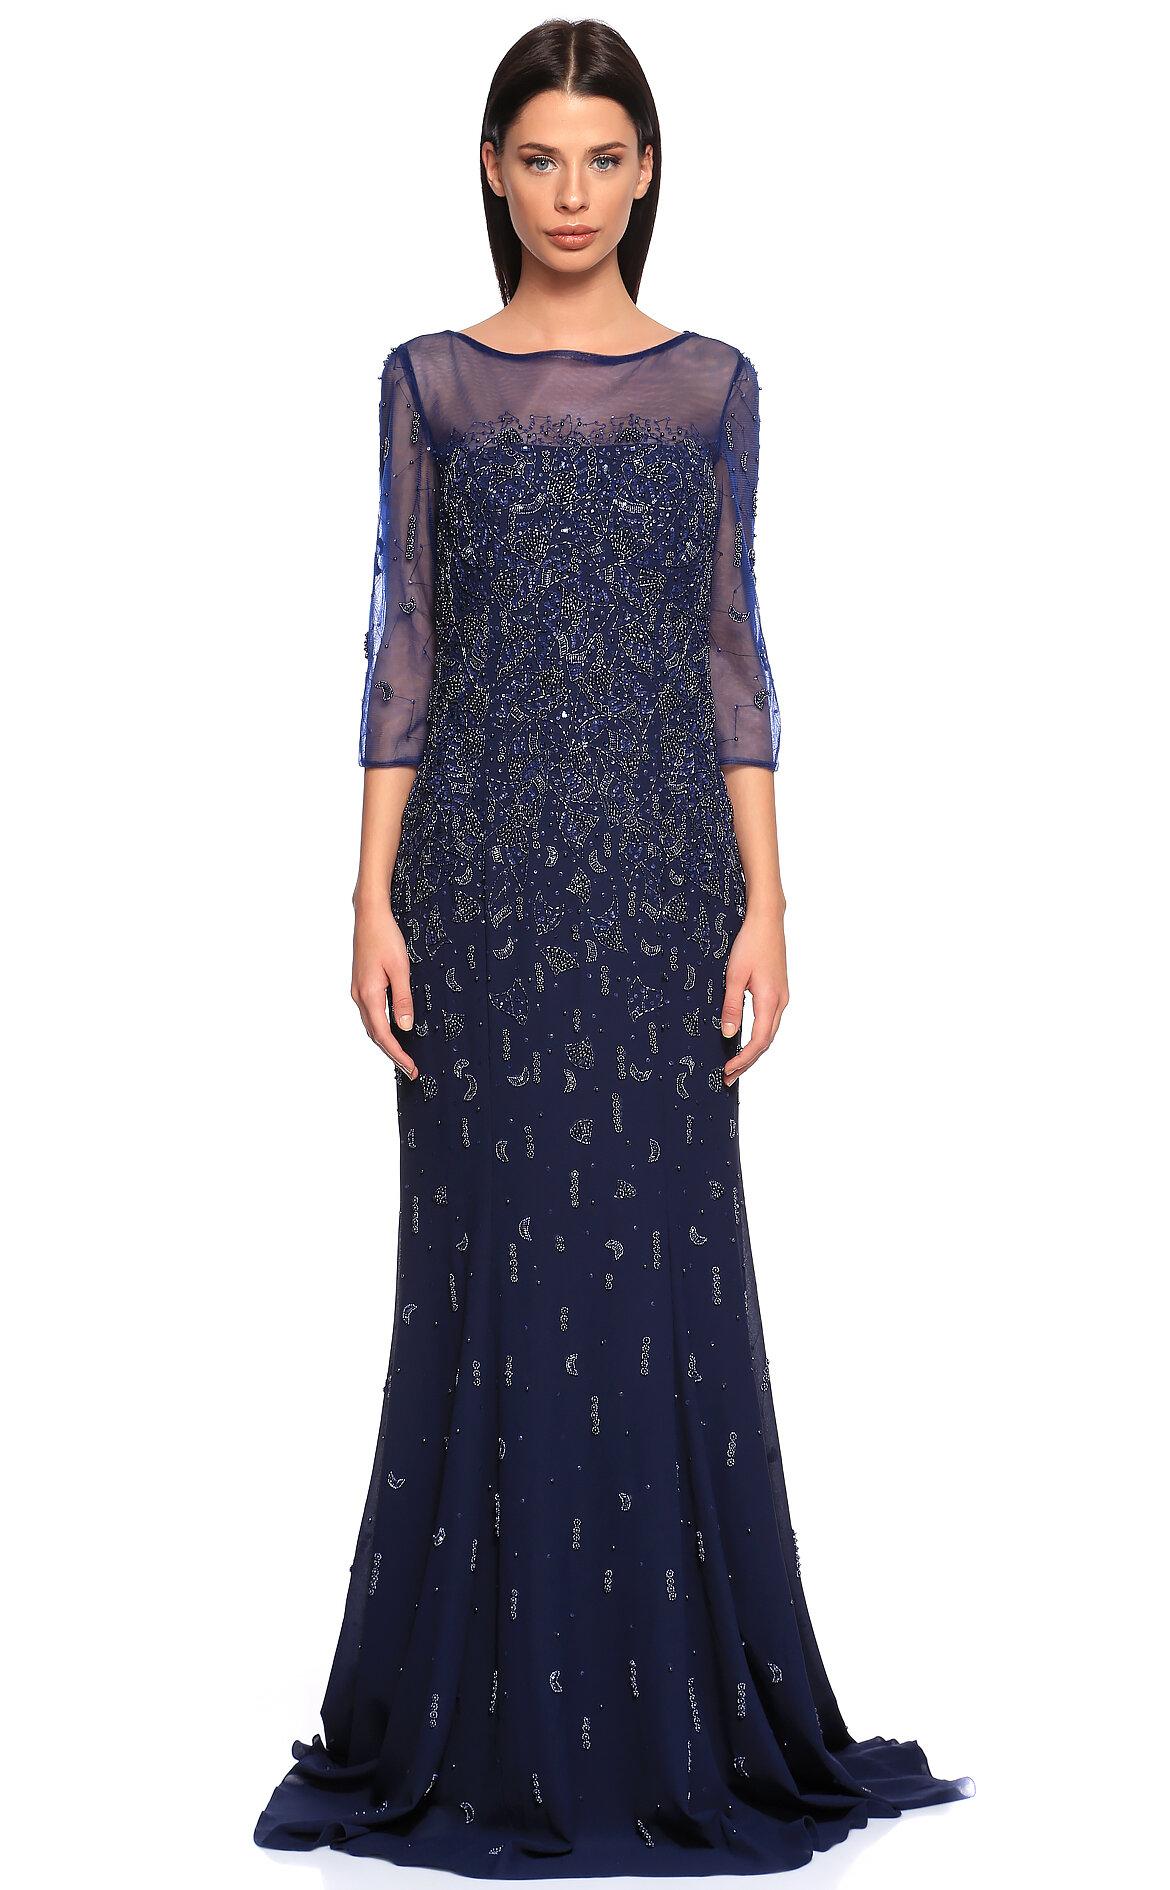 c8121a91e3e07 Jovani Kadın Lacivert Gece Elbisesi JVN41876ANAVY-NAVY - Brandroom